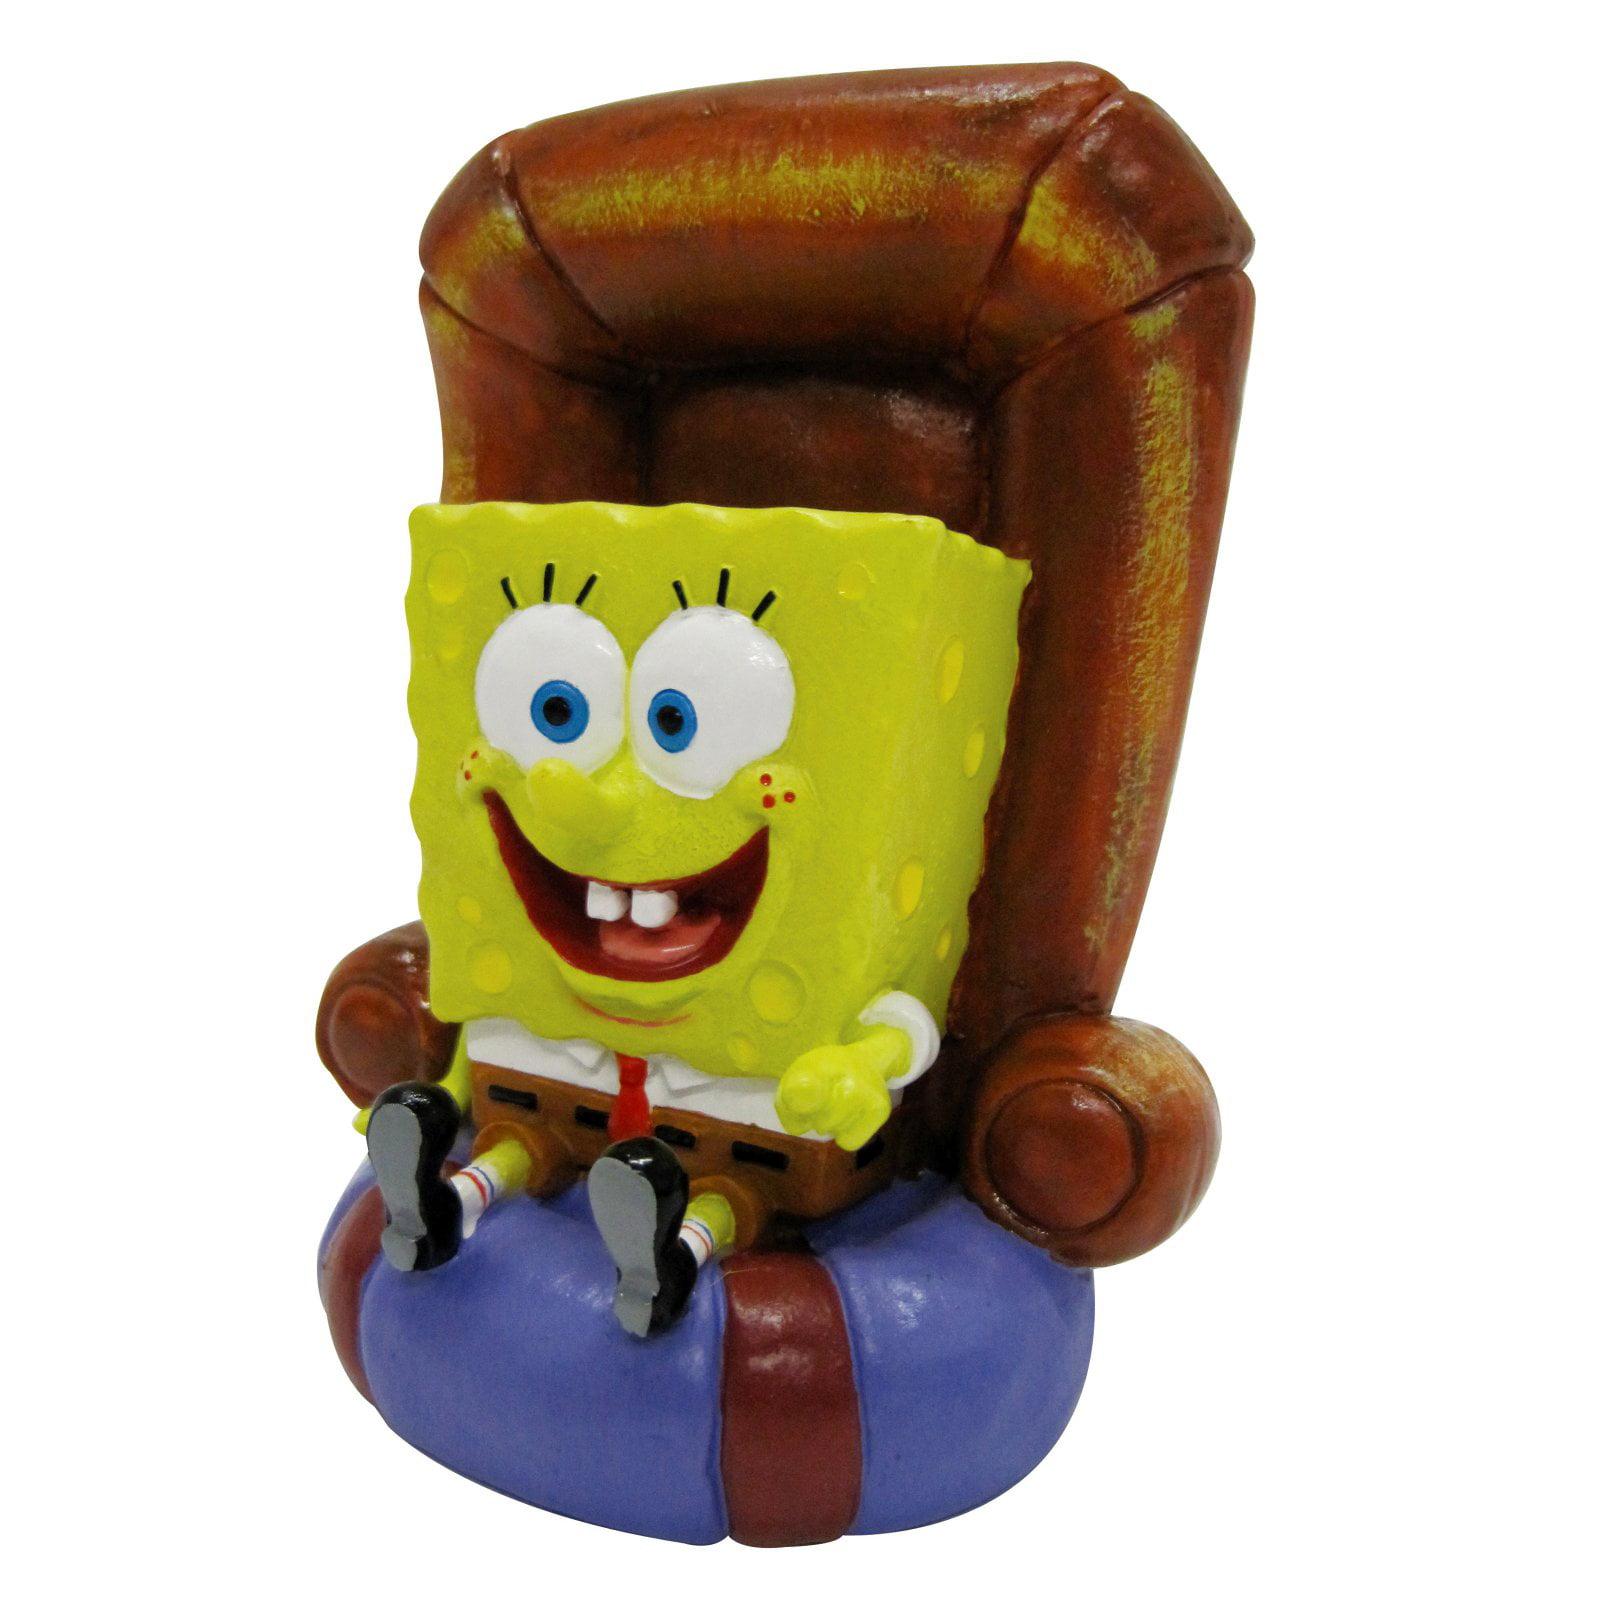 Penn Plax SpongeBob in Chair Aquarium Figure